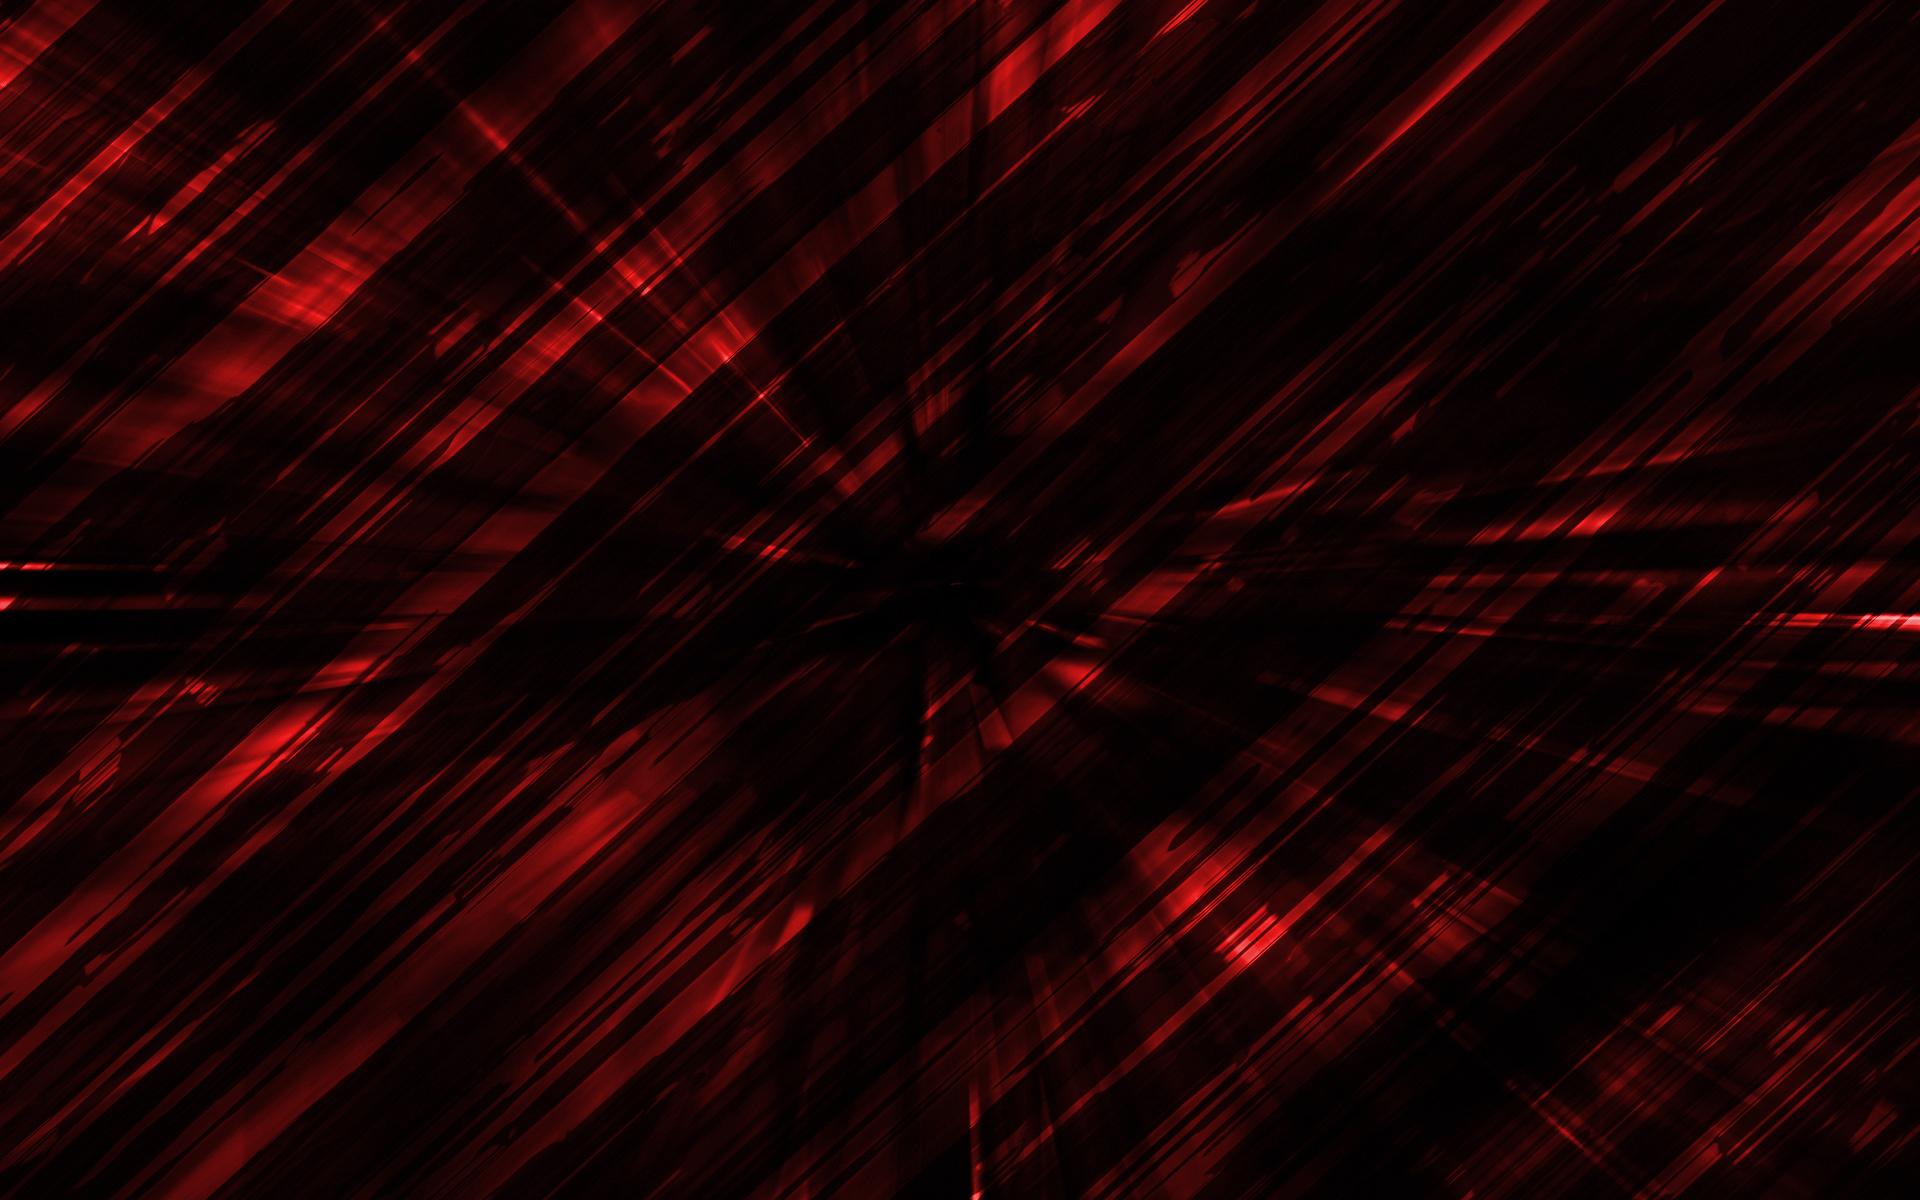 ipad wallpaper black hole